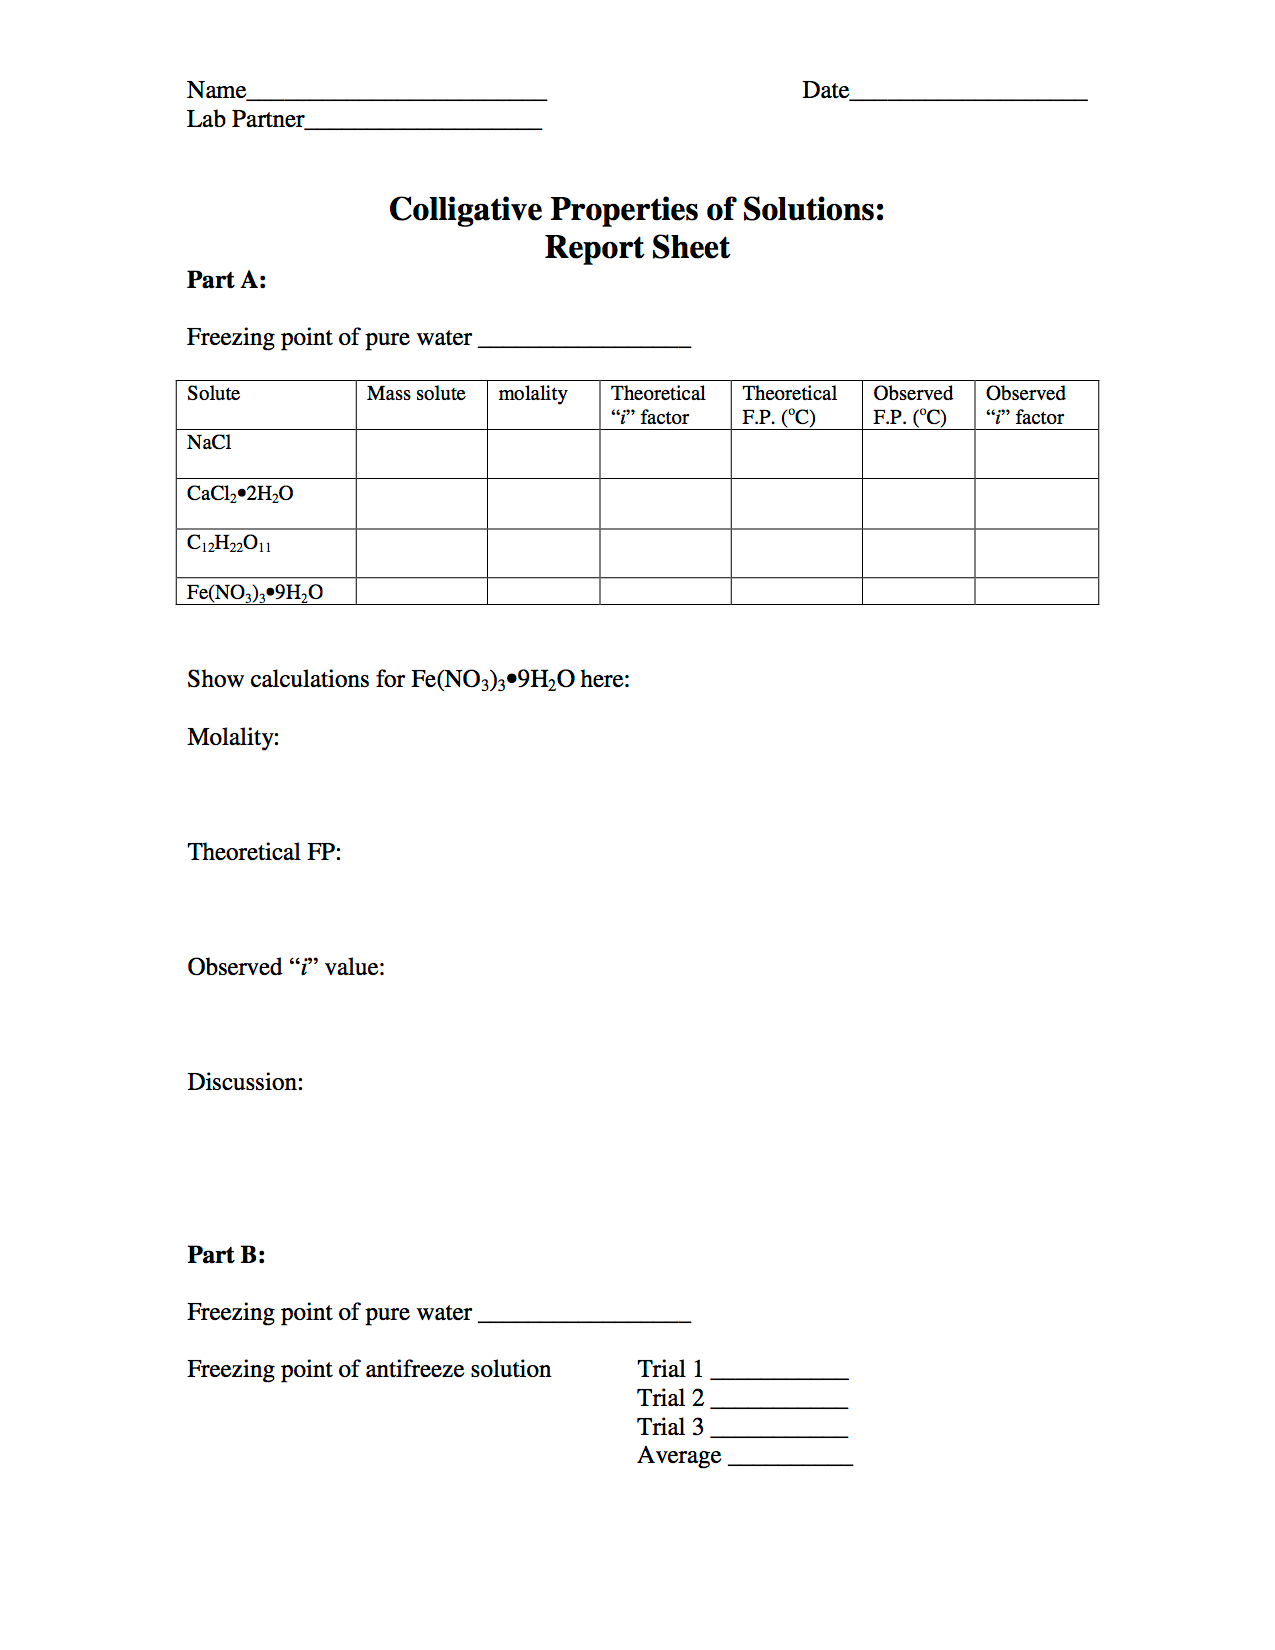 colligative properties lab report